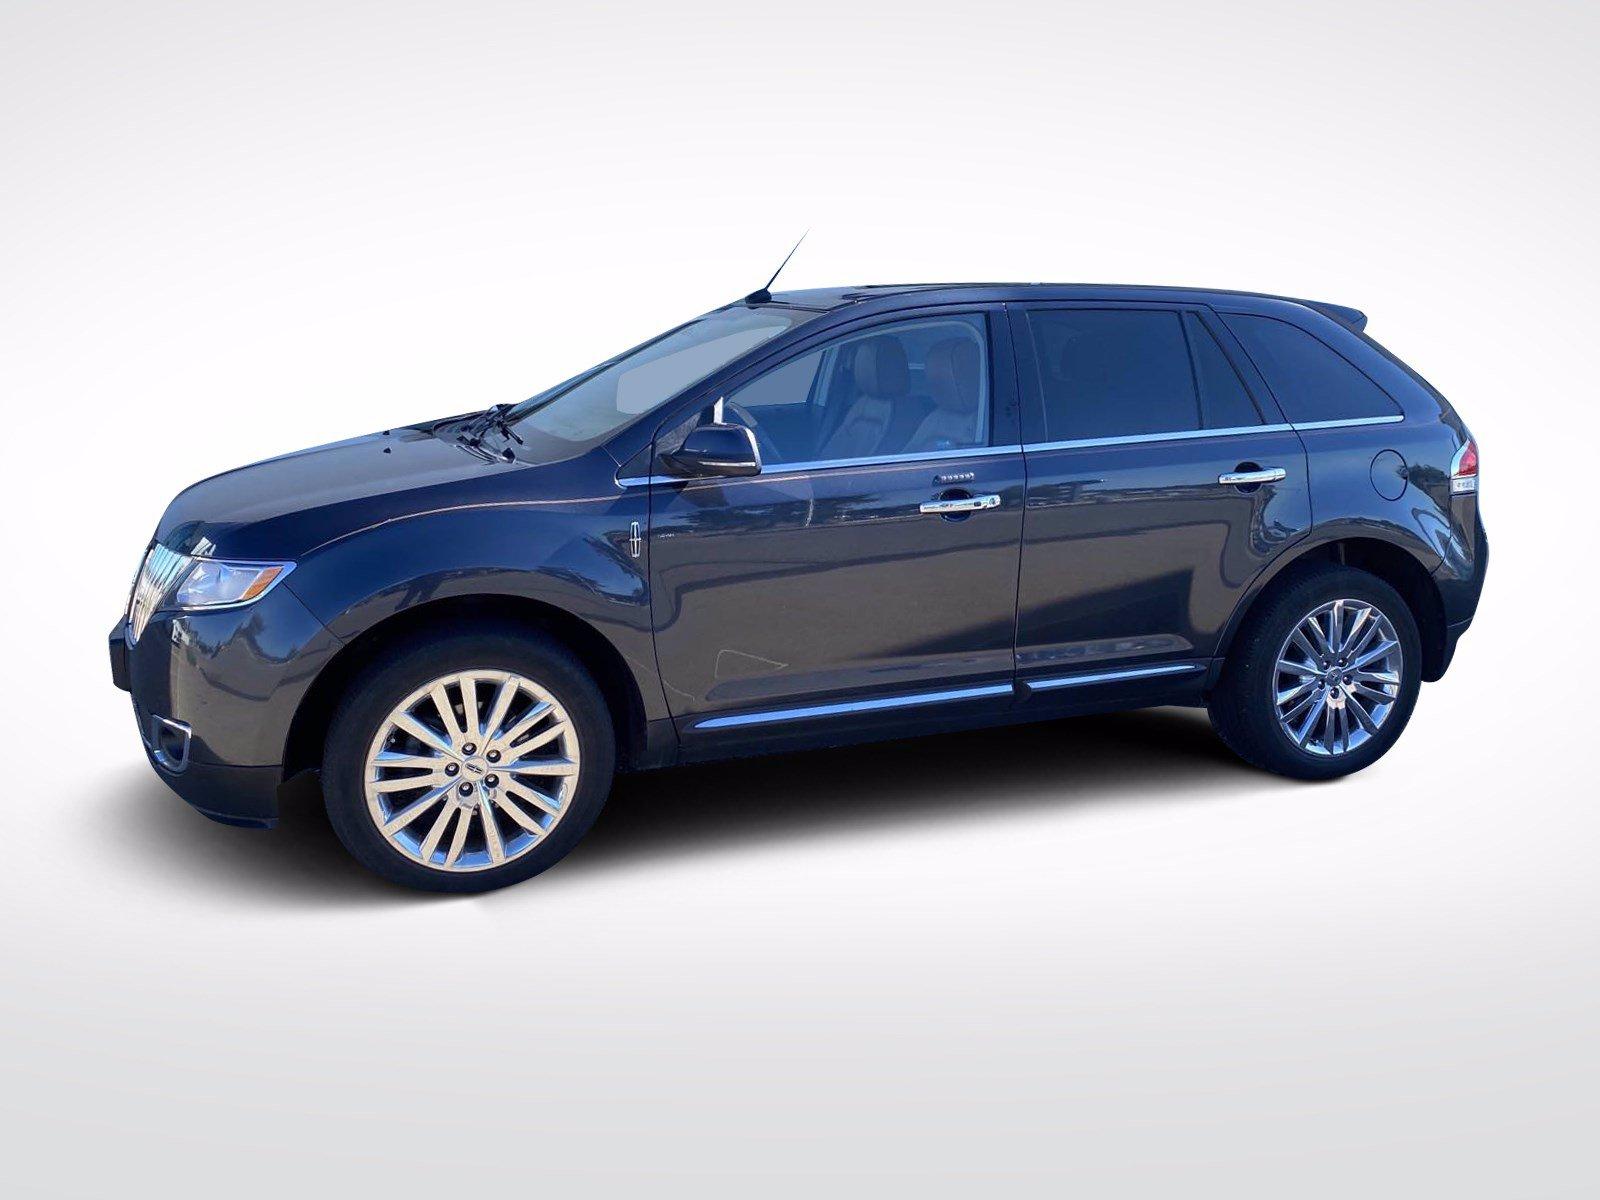 Used 2013 Lincoln MKX  with VIN 2LMDJ8JK4DBL15255 for sale in Baxter, Minnesota